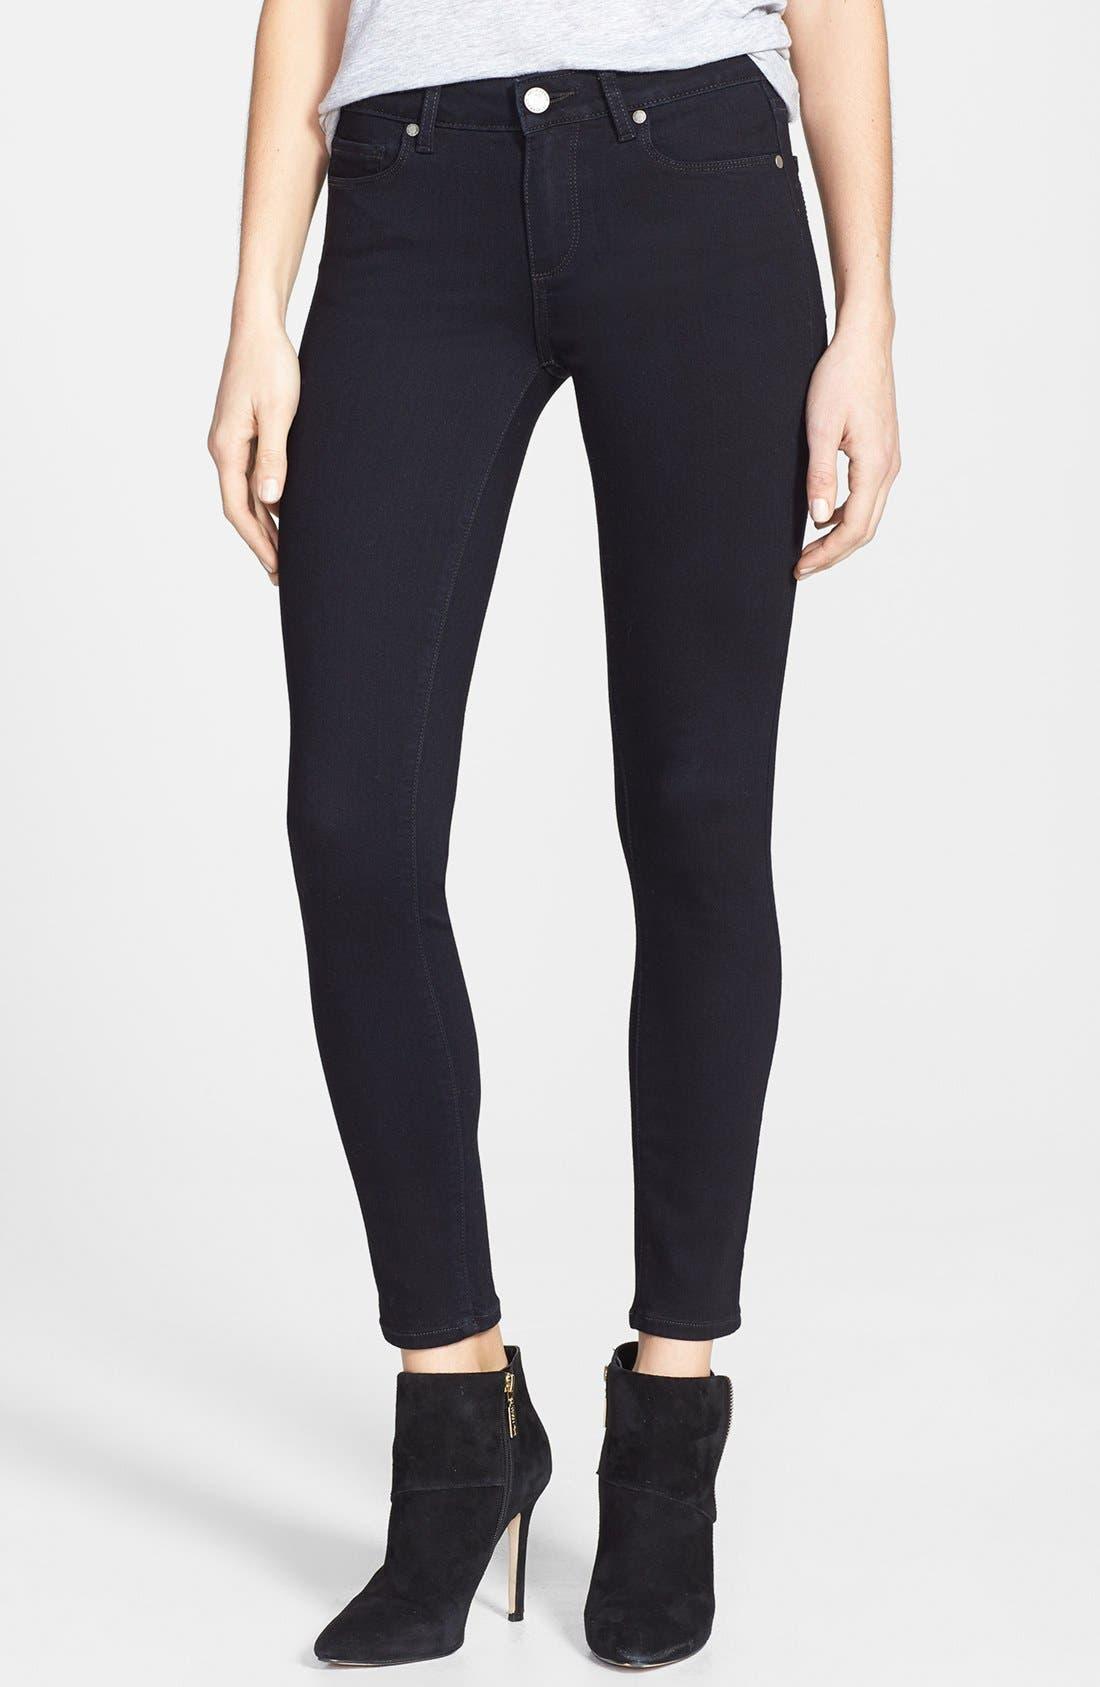 Alternate Image 1 Selected - Paige Denim 'Verdugo' Skinny Ankle Jeans (Kensington)